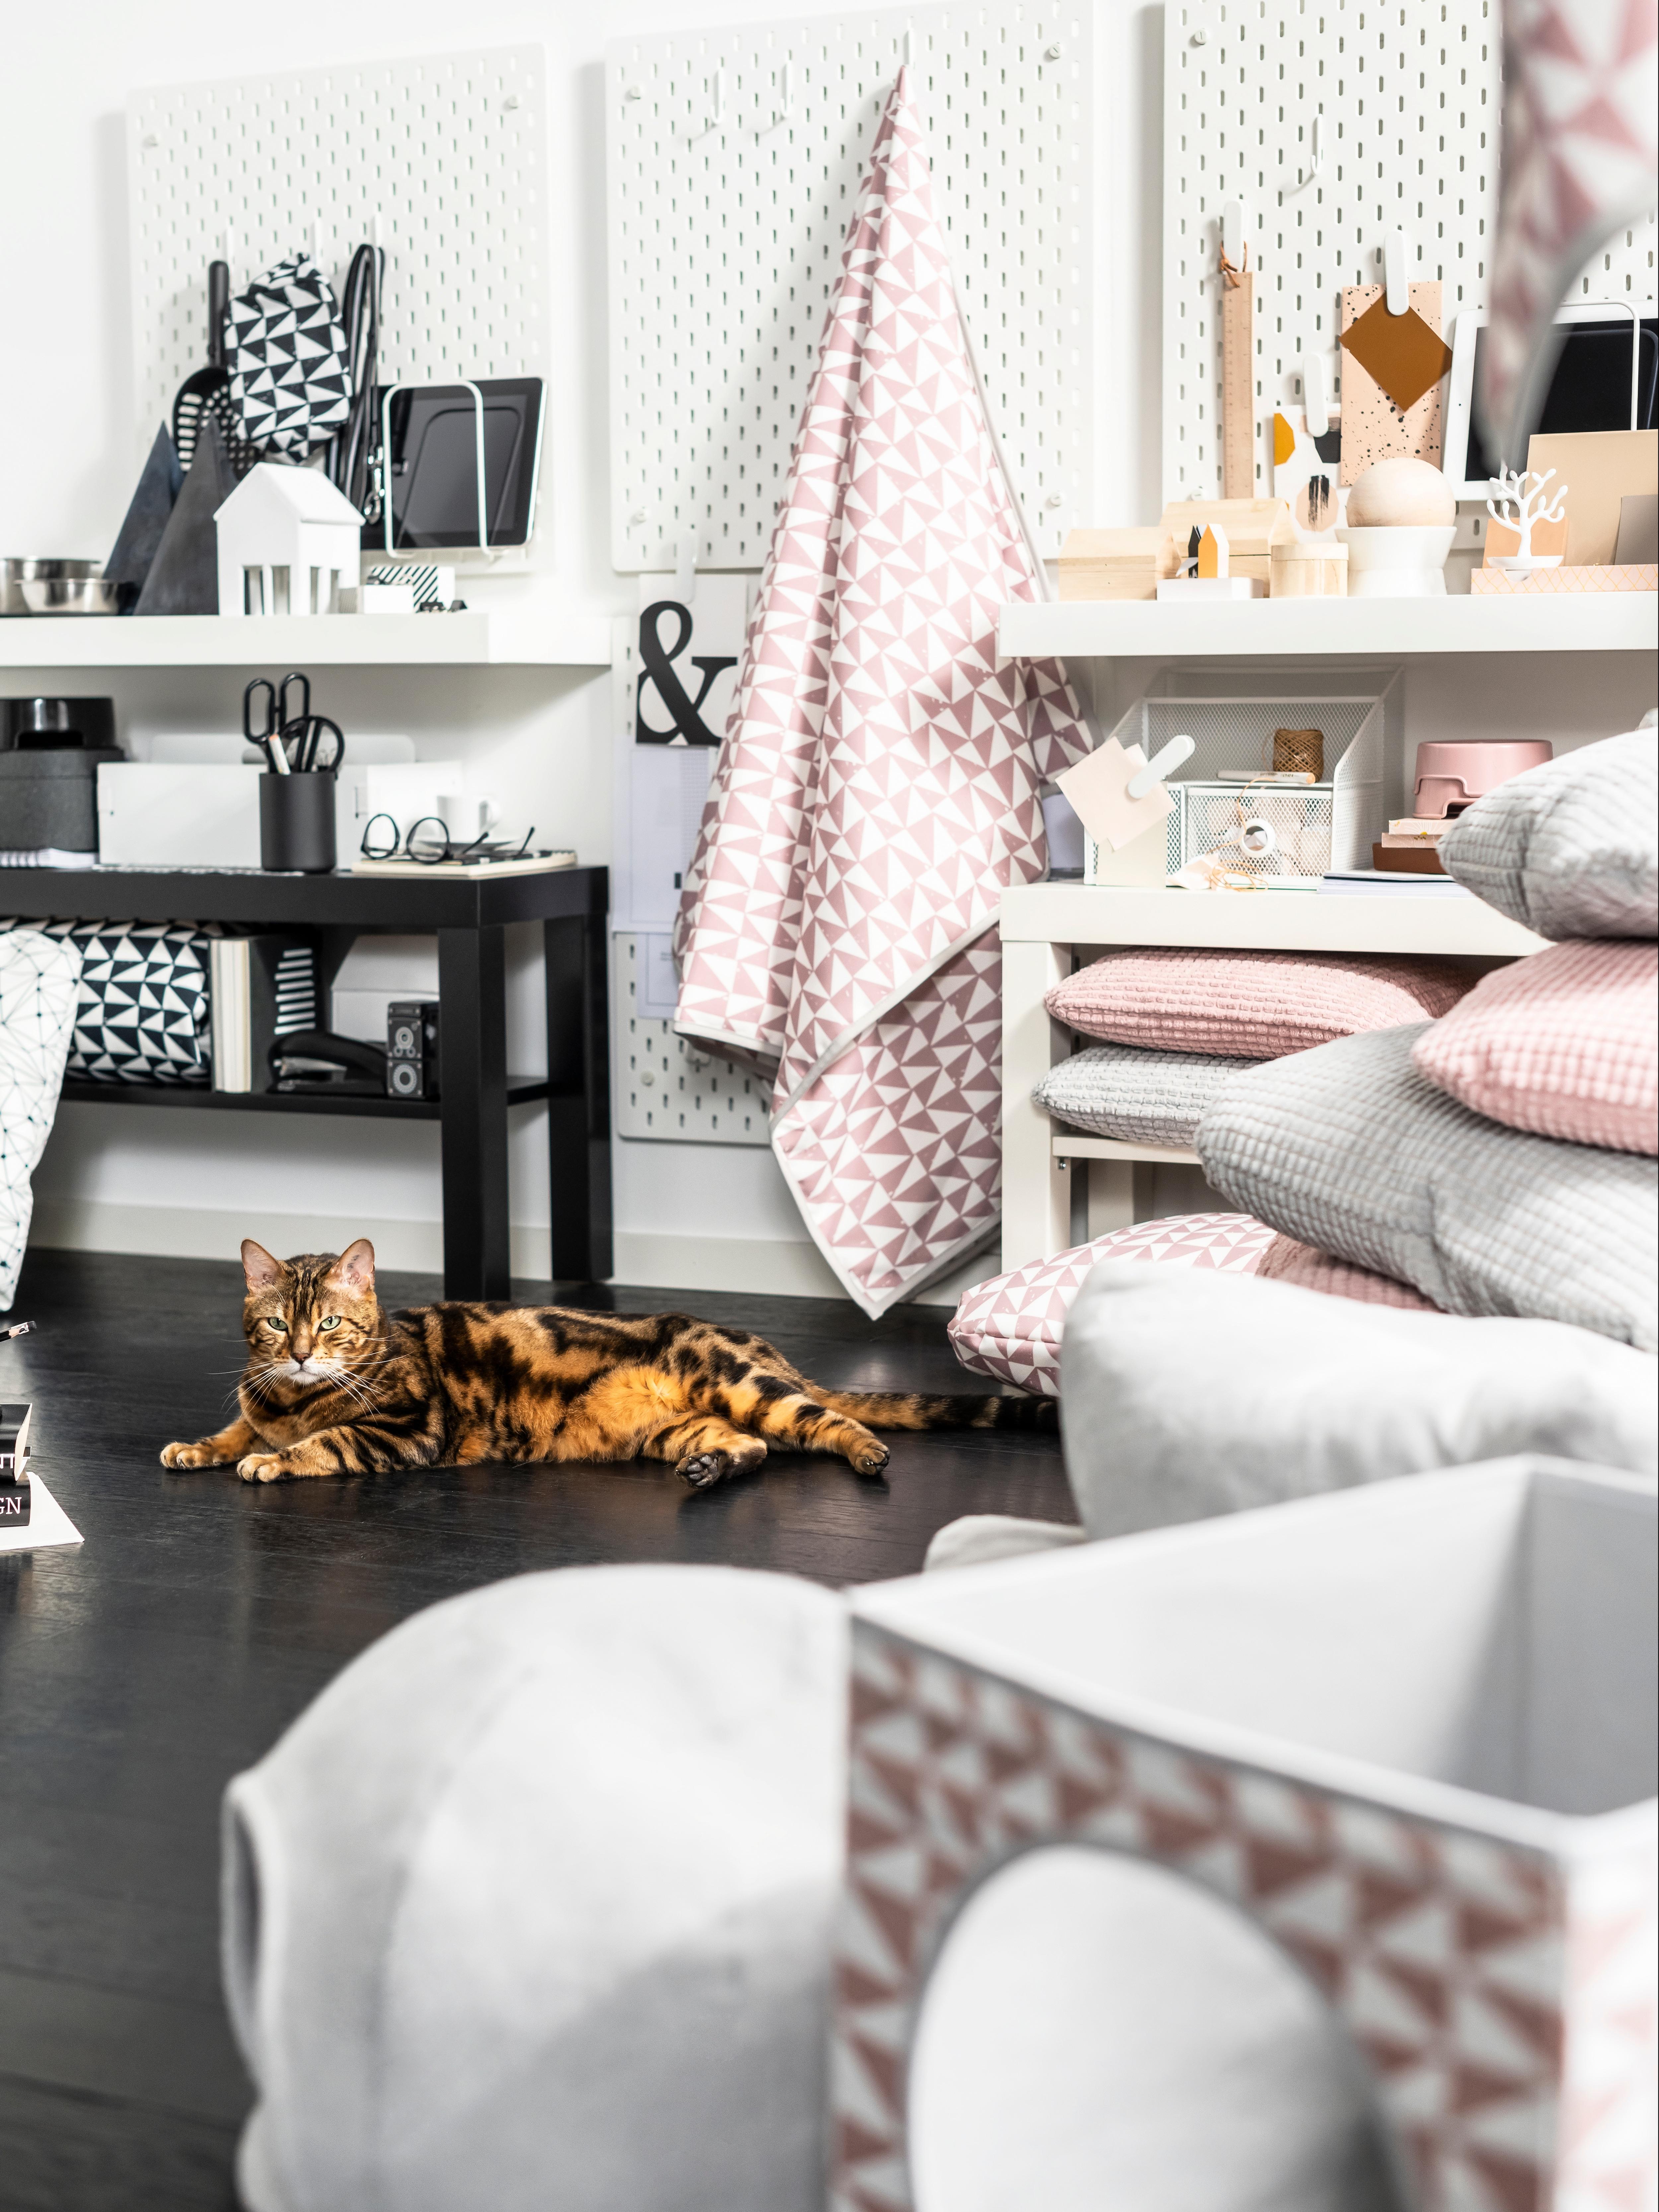 Smeđa mačka ispod LURVIG roze deke s uzorkom okružena jastucima ispred SKÅDIS rupičaste ploče i LACK stola.